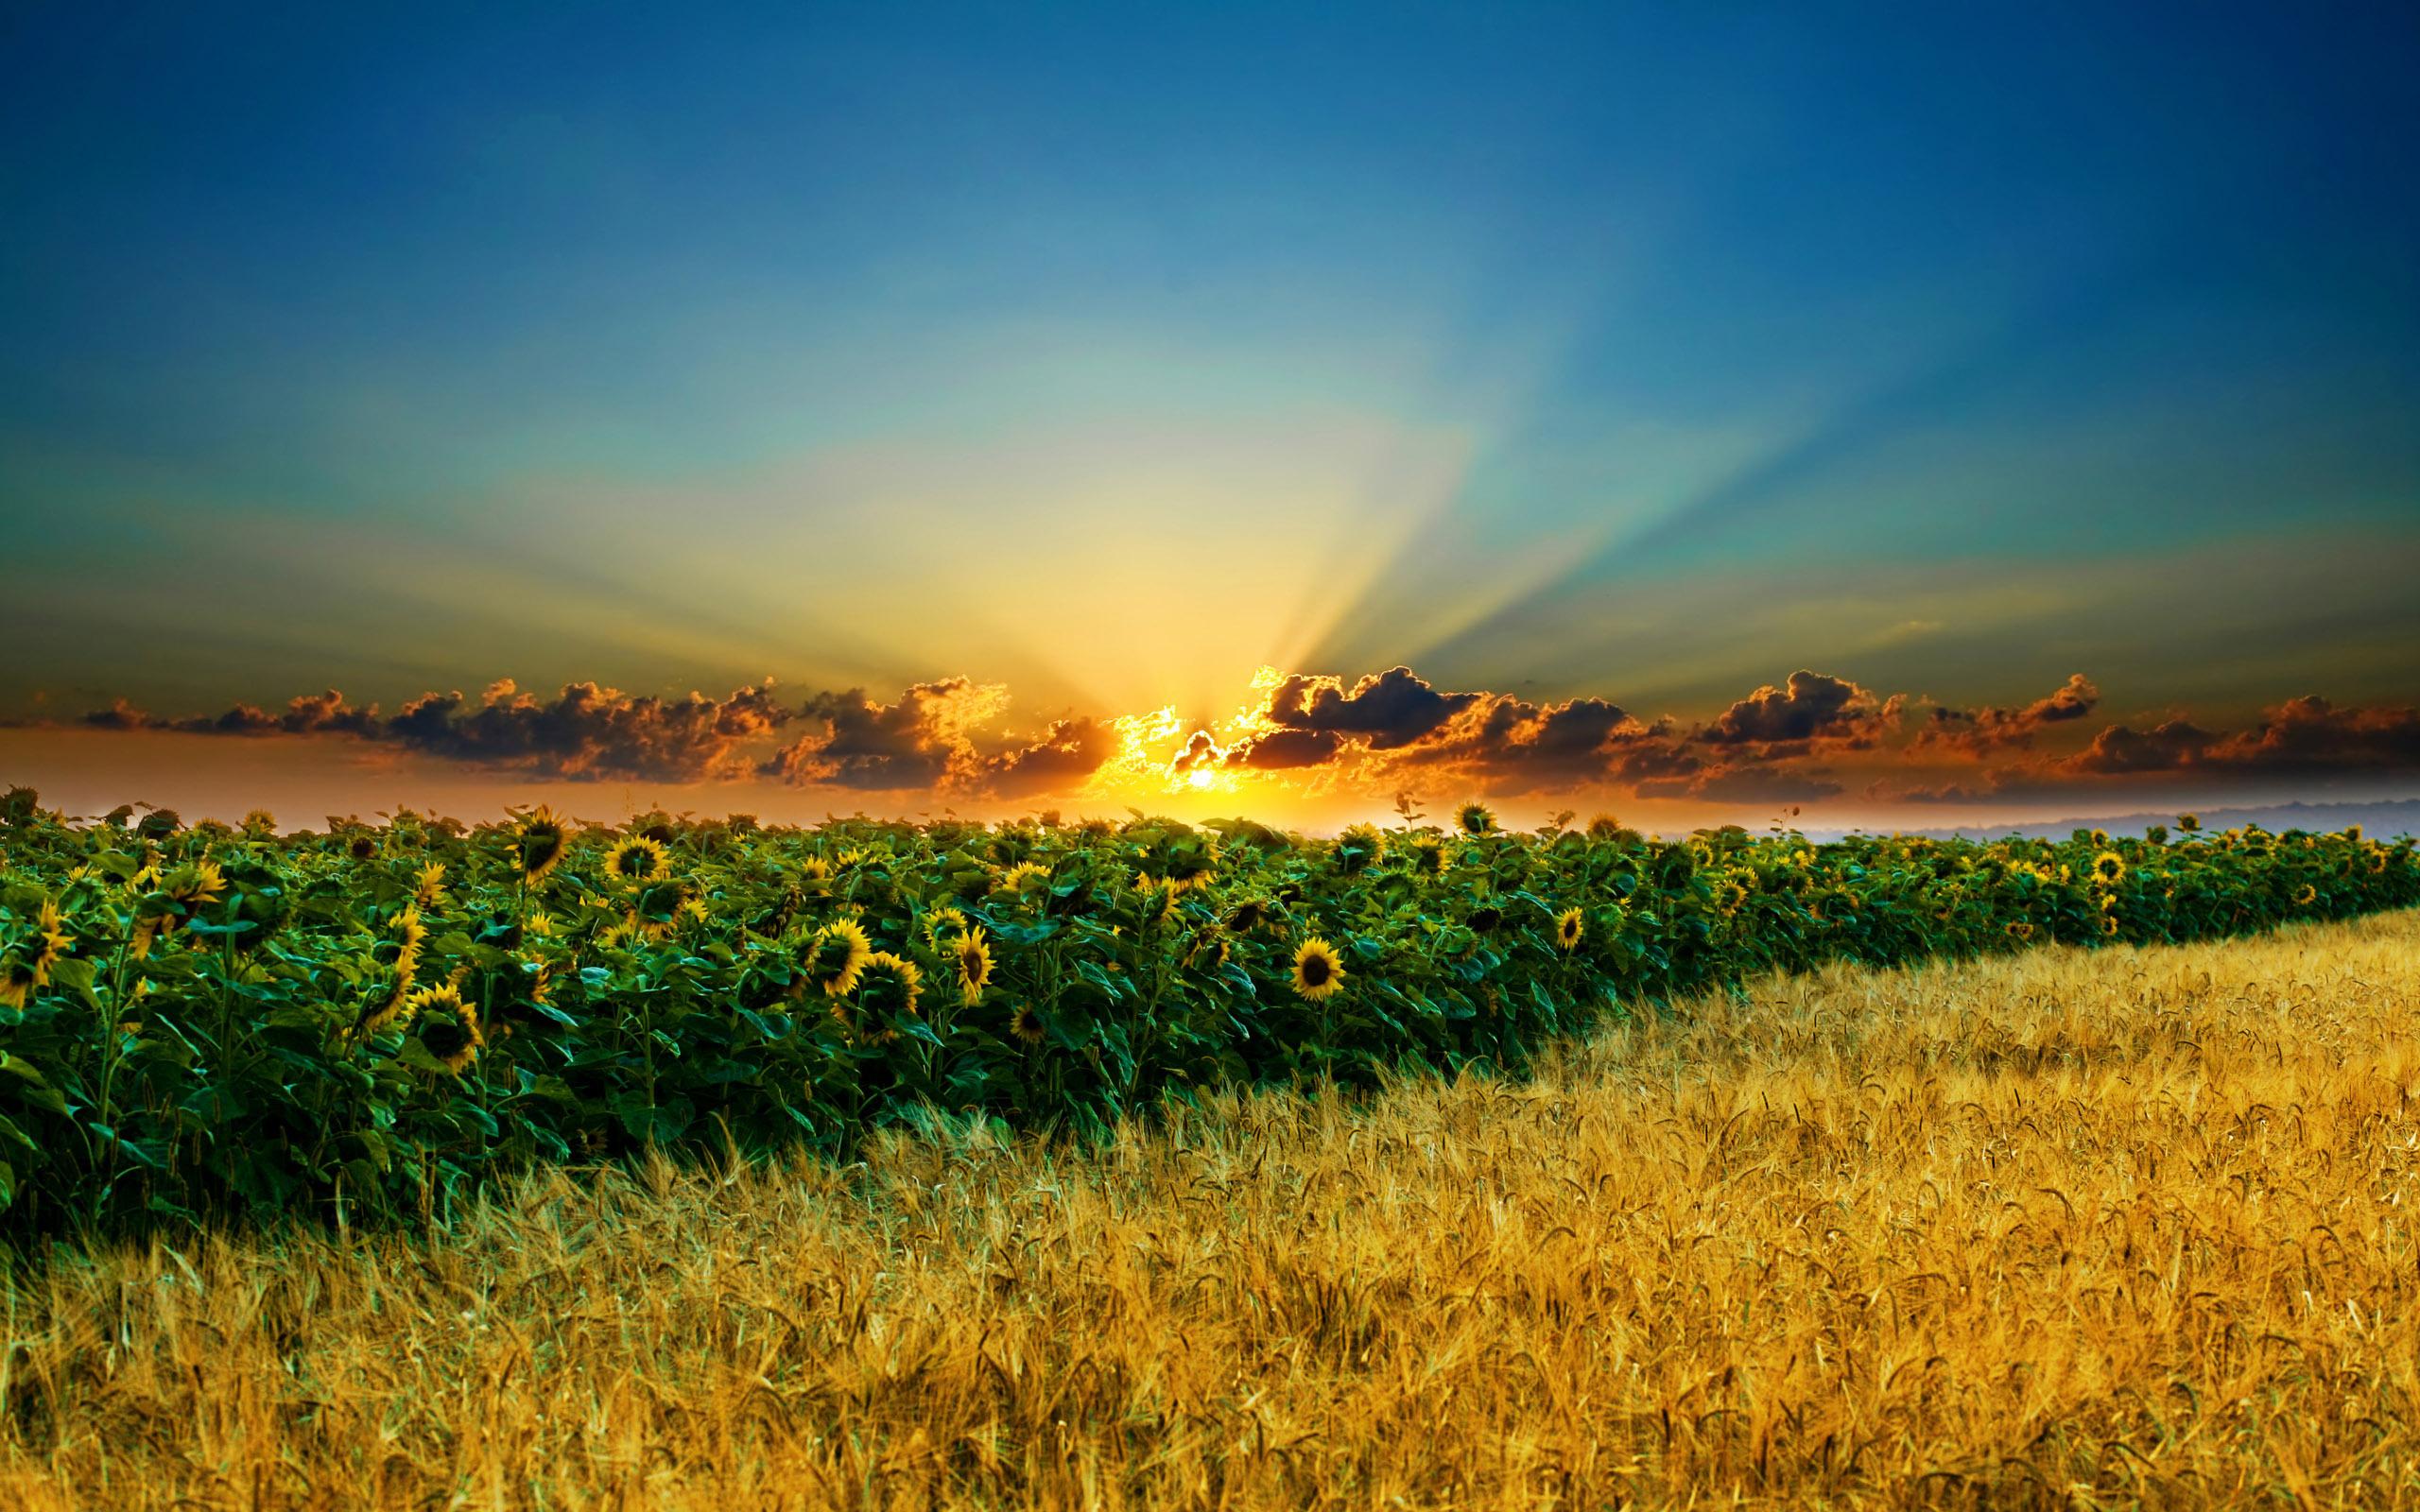 подсолнухи поле sunflowers field  № 419180 бесплатно